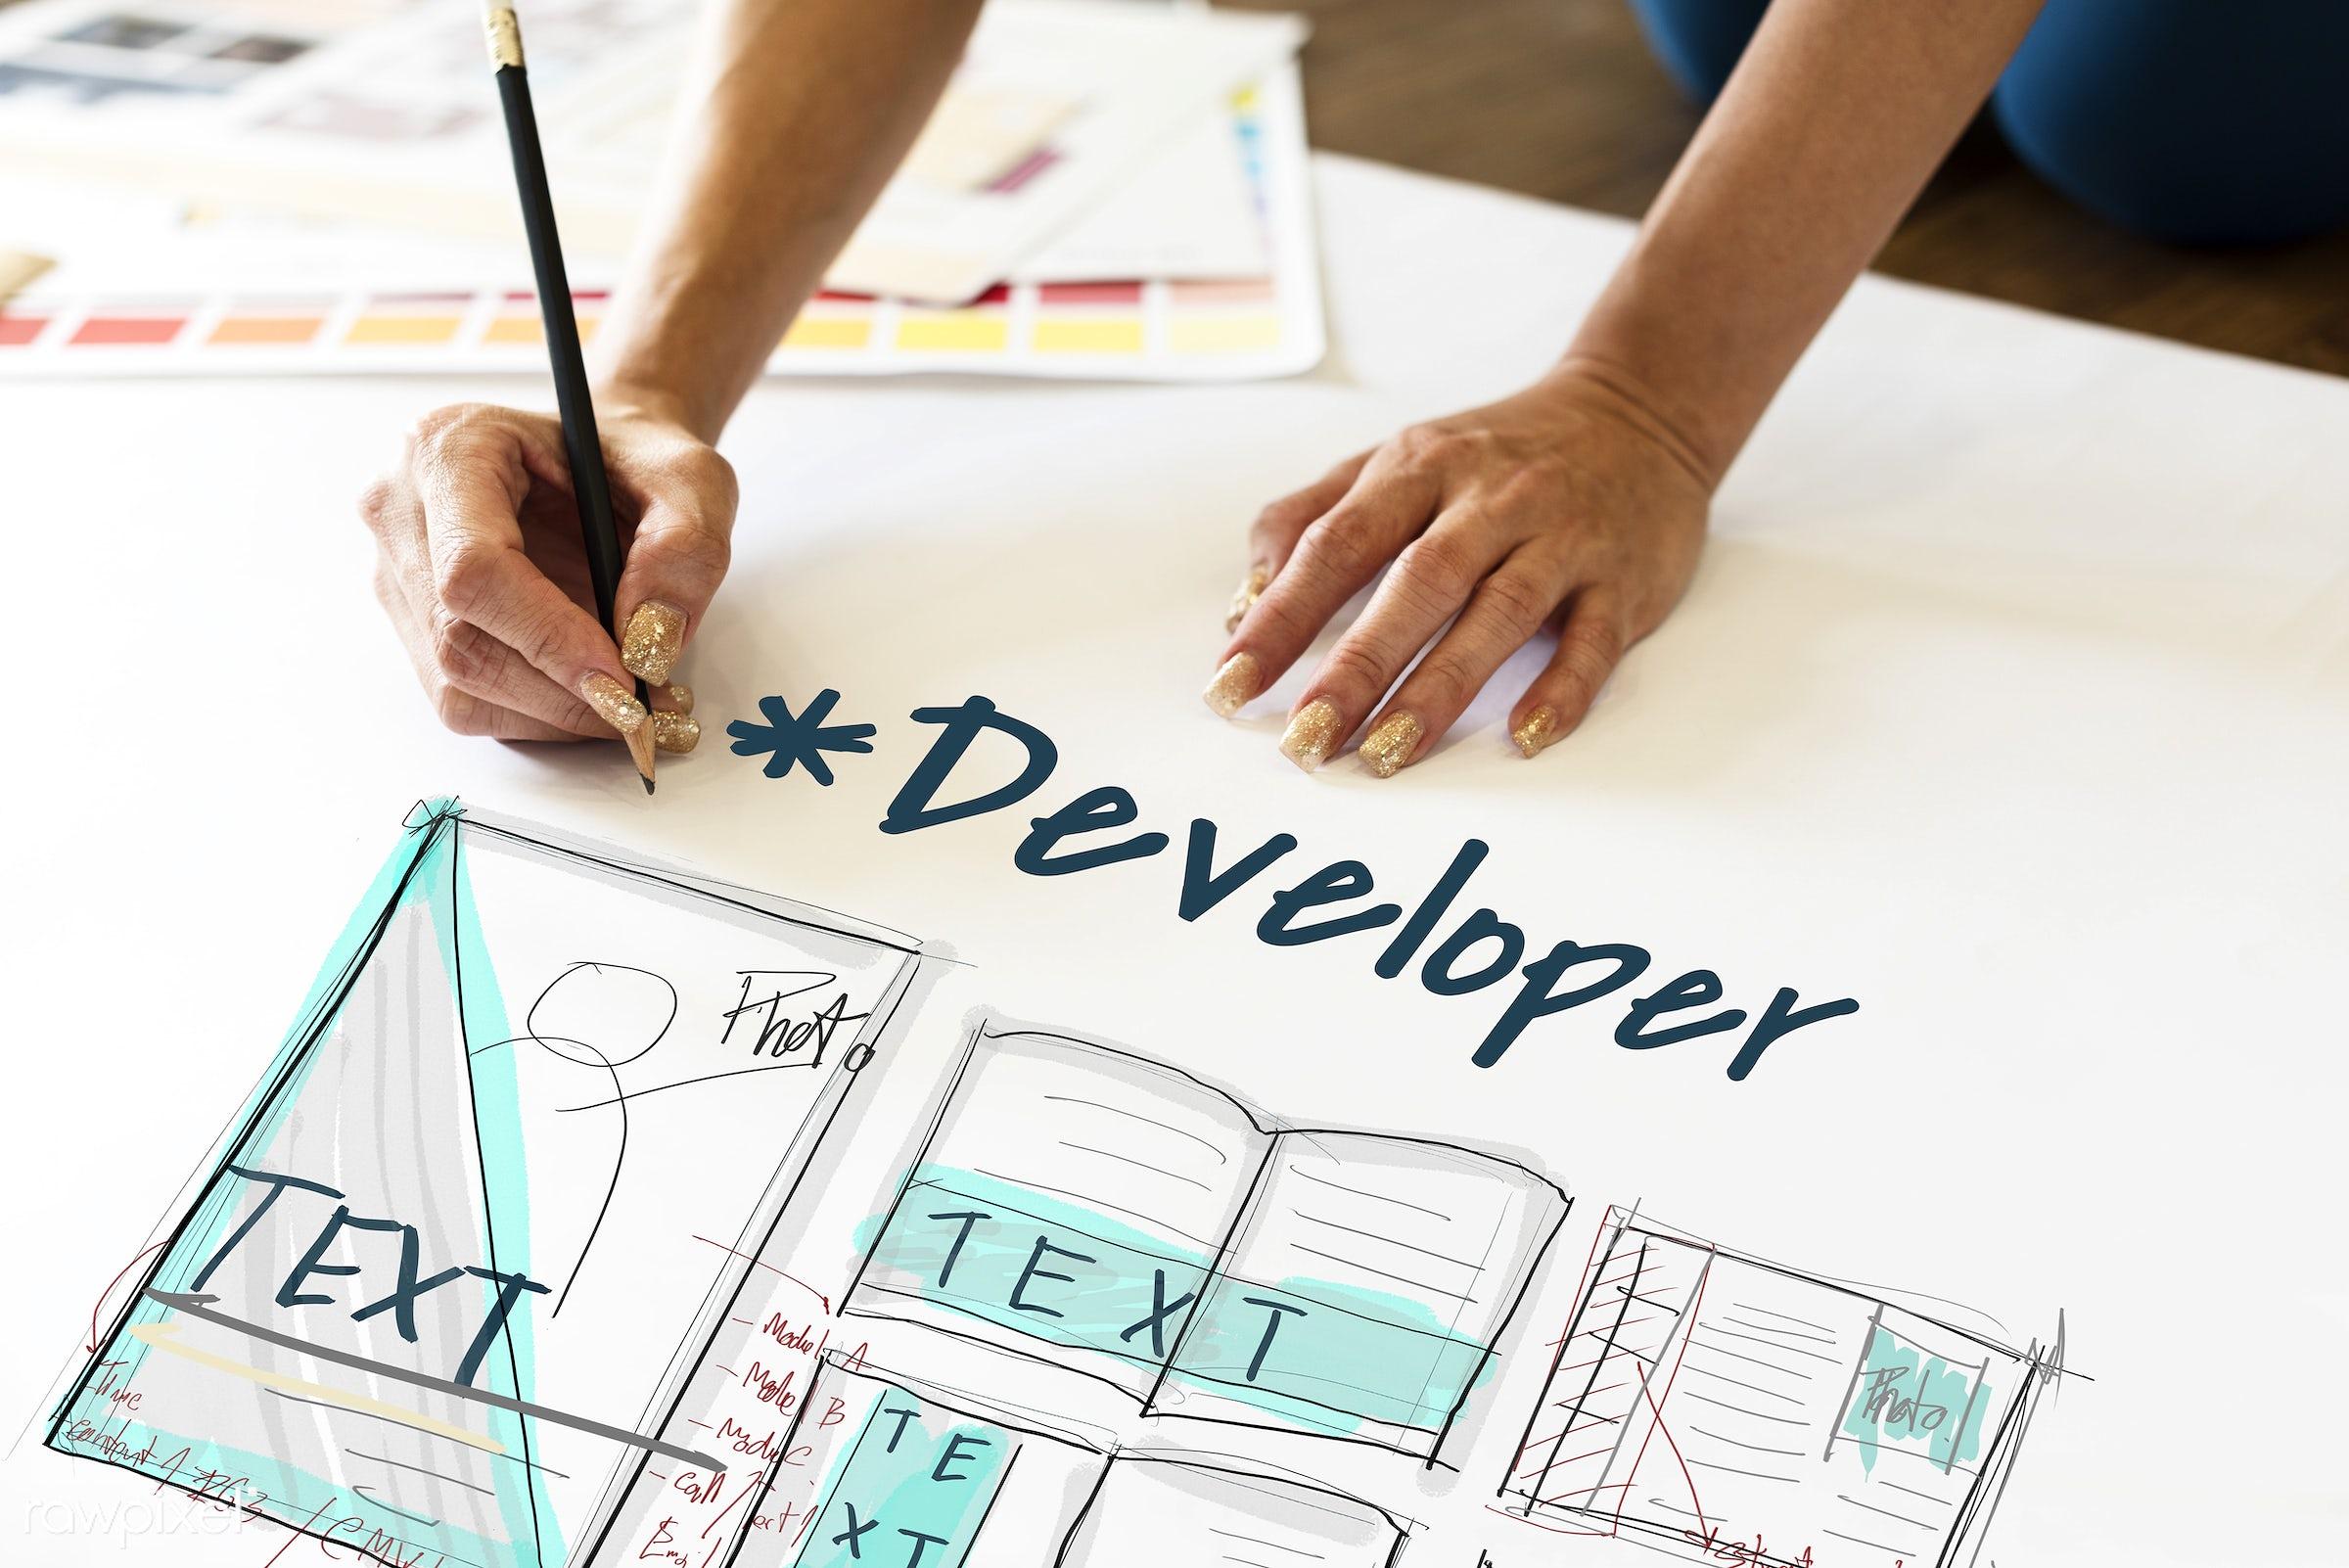 art, books, content, creation, creative, creativity, design, developer, digital, draft, drawing, e-book, e-publishing,...